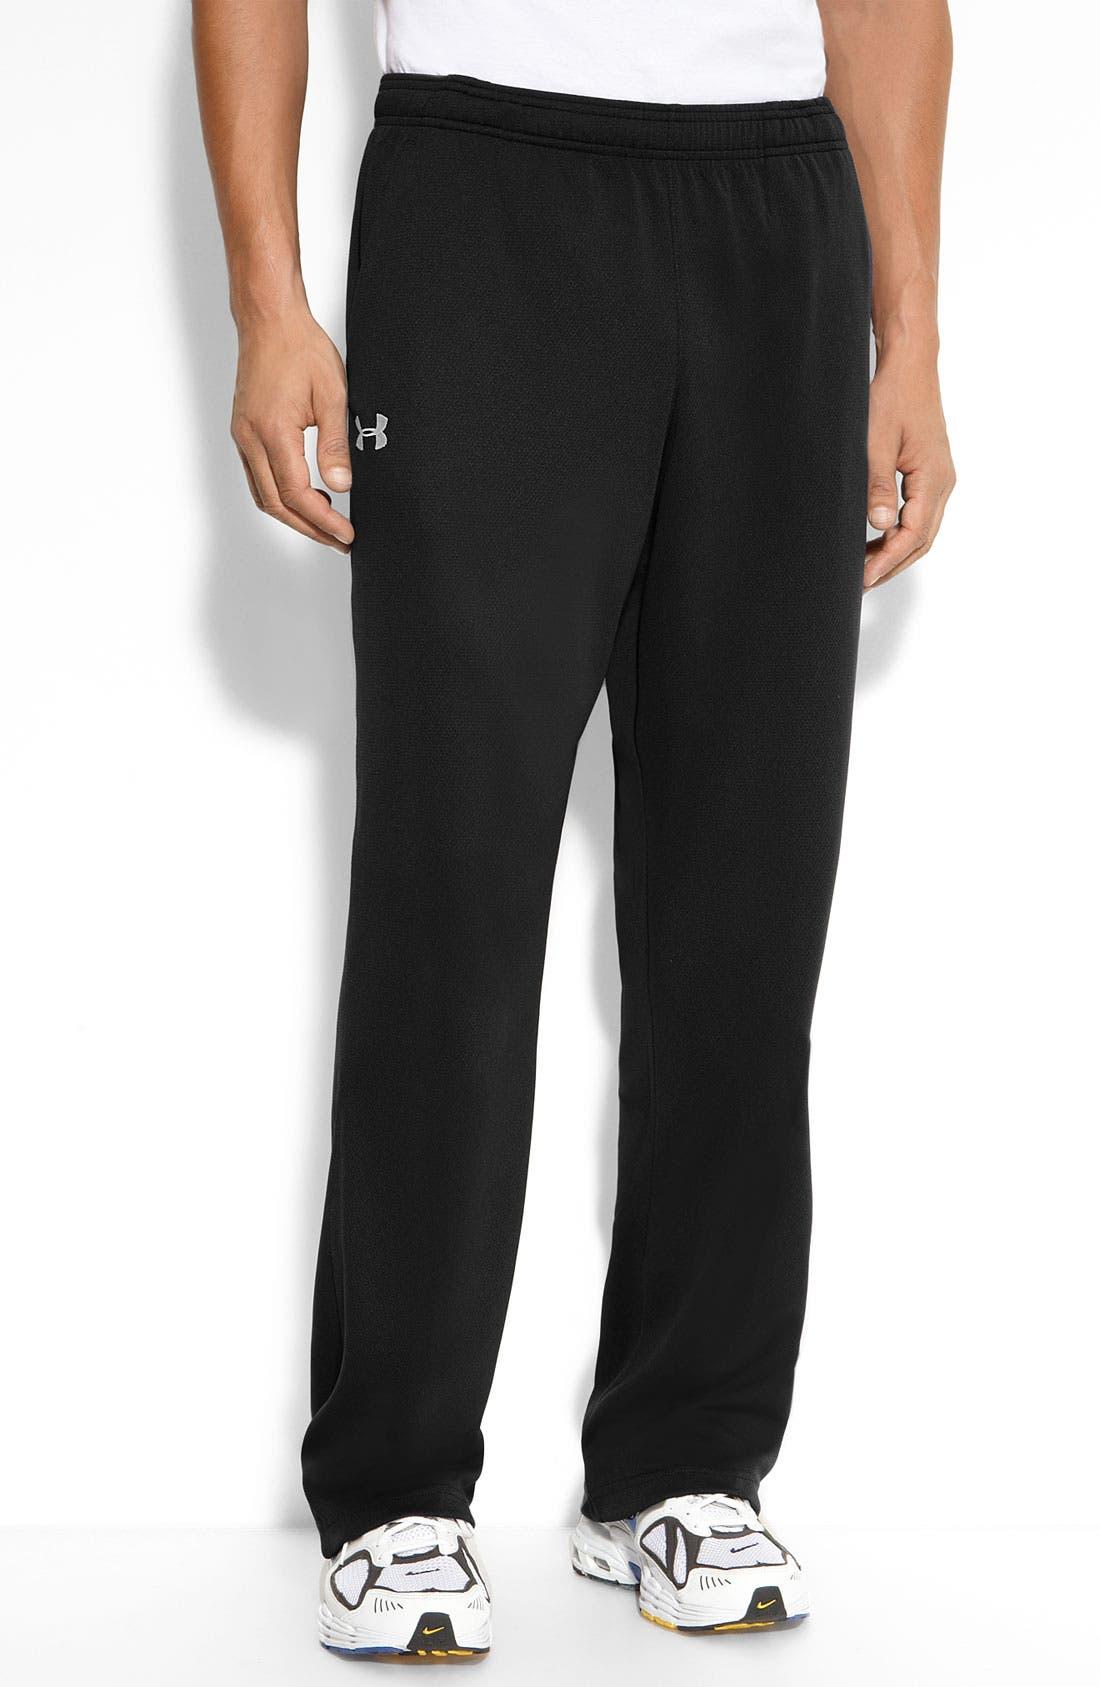 'Flex' AllSeasonGear<sup>®</sup> Mesh Pants,                         Main,                         color, 002